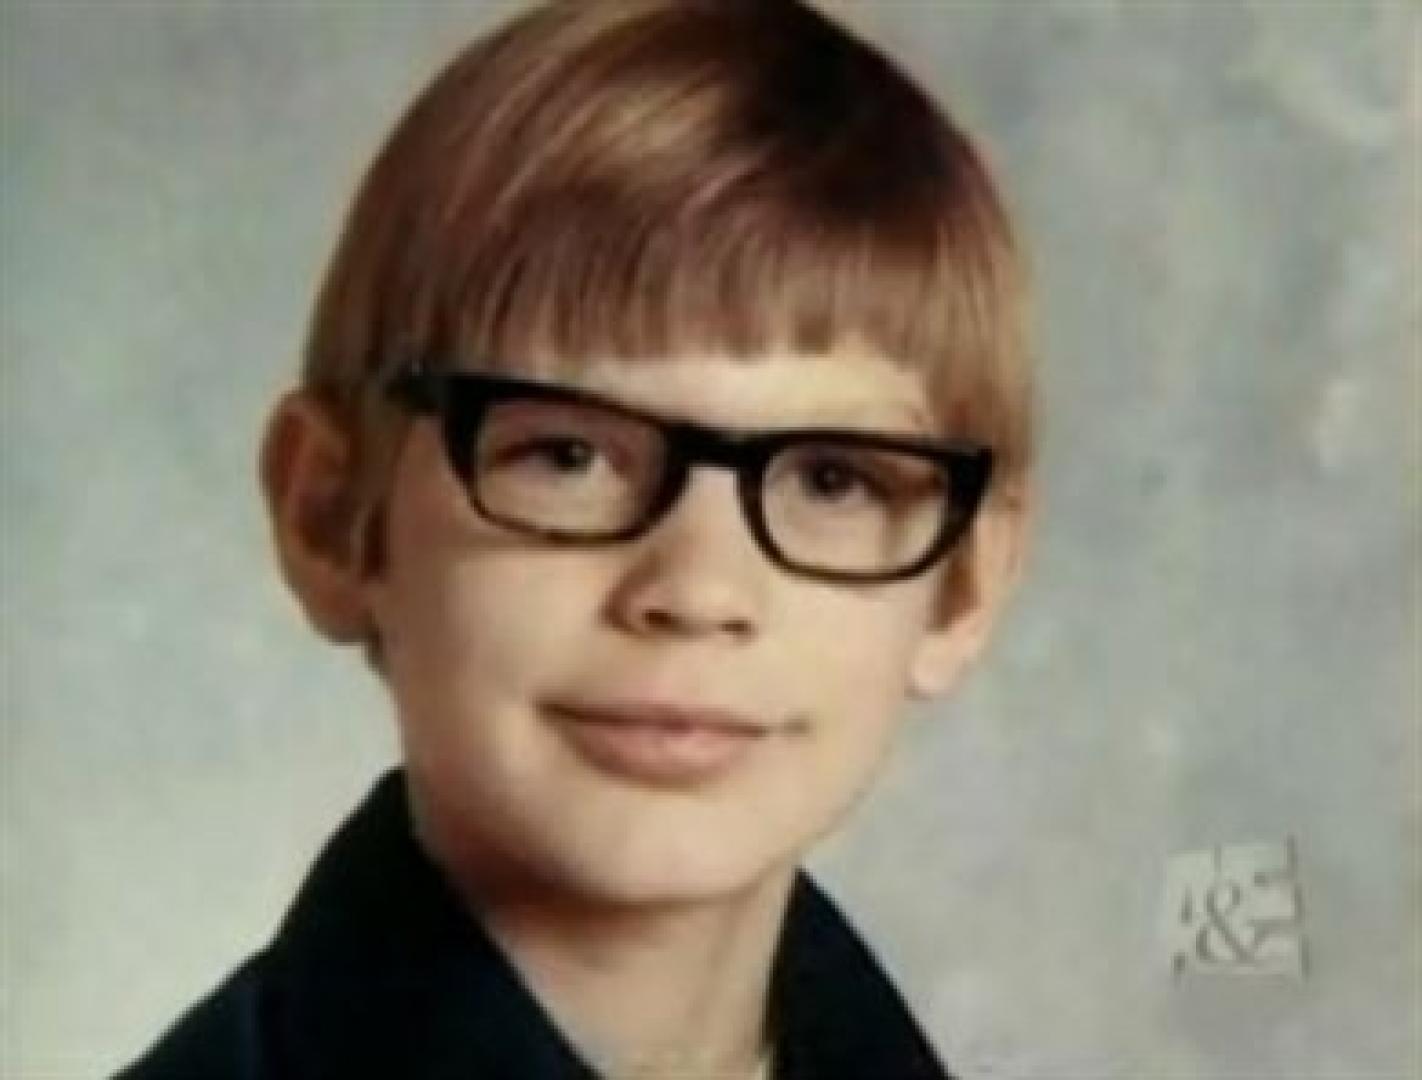 Jeffrey Dahmer 1. kép